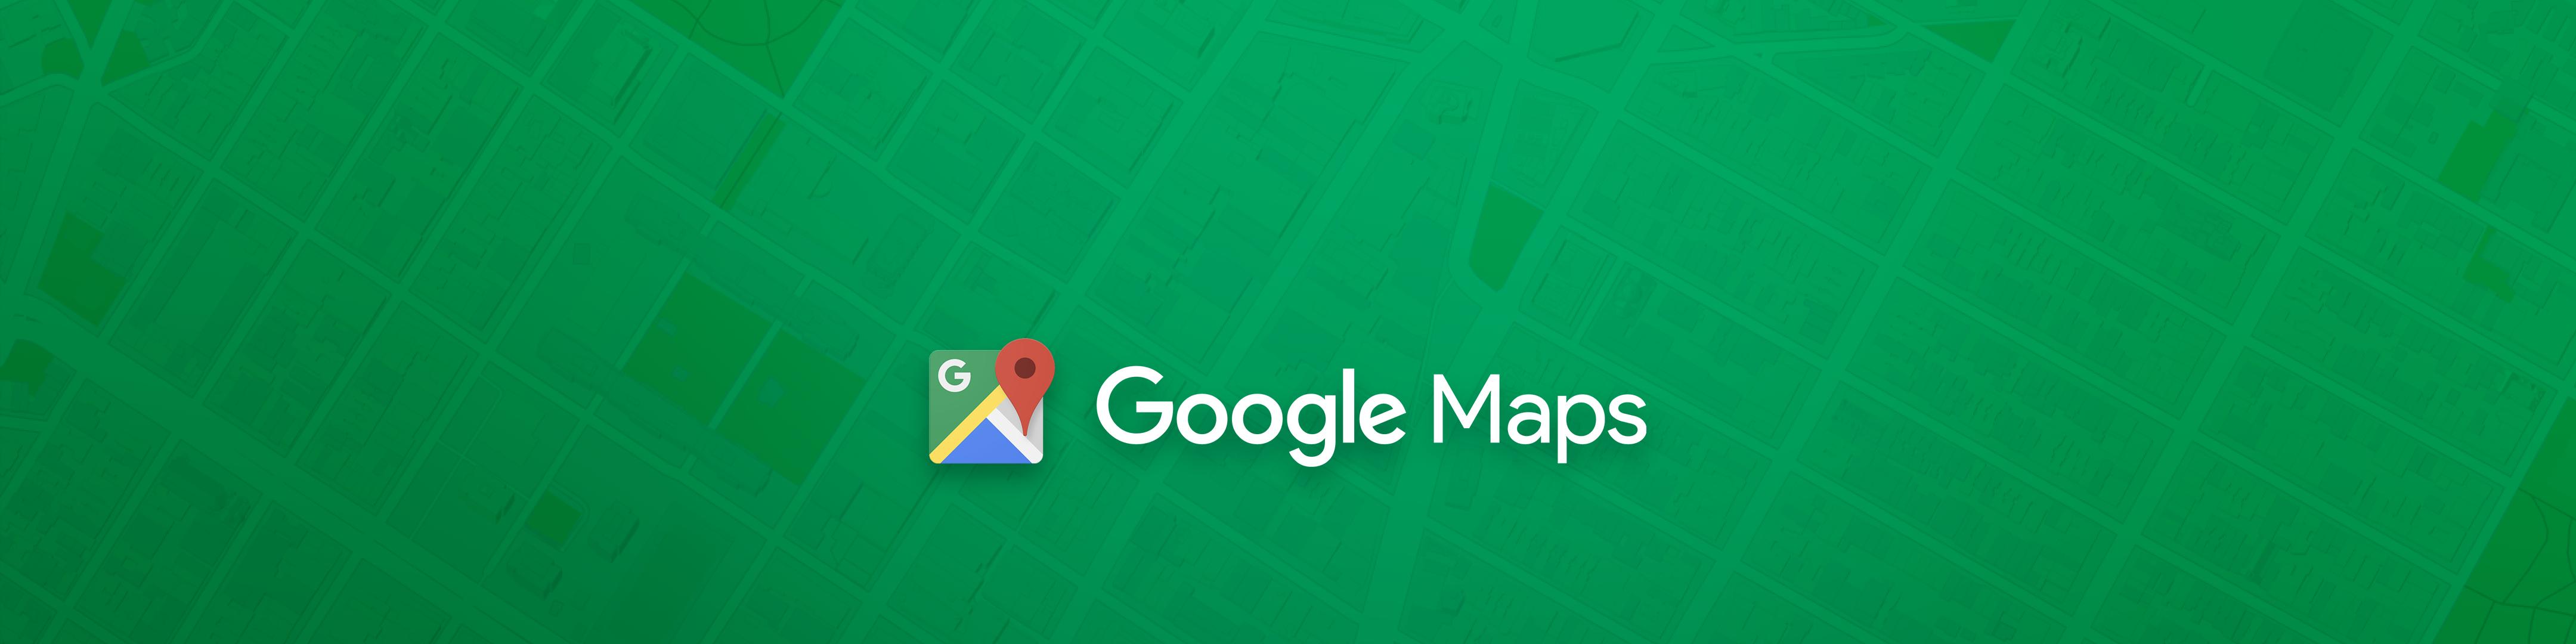 Google Maps - Transit & Food - Revenue & Download estimates ... on google maps for iphone, android market app store, google navigation app, google maps a to b,